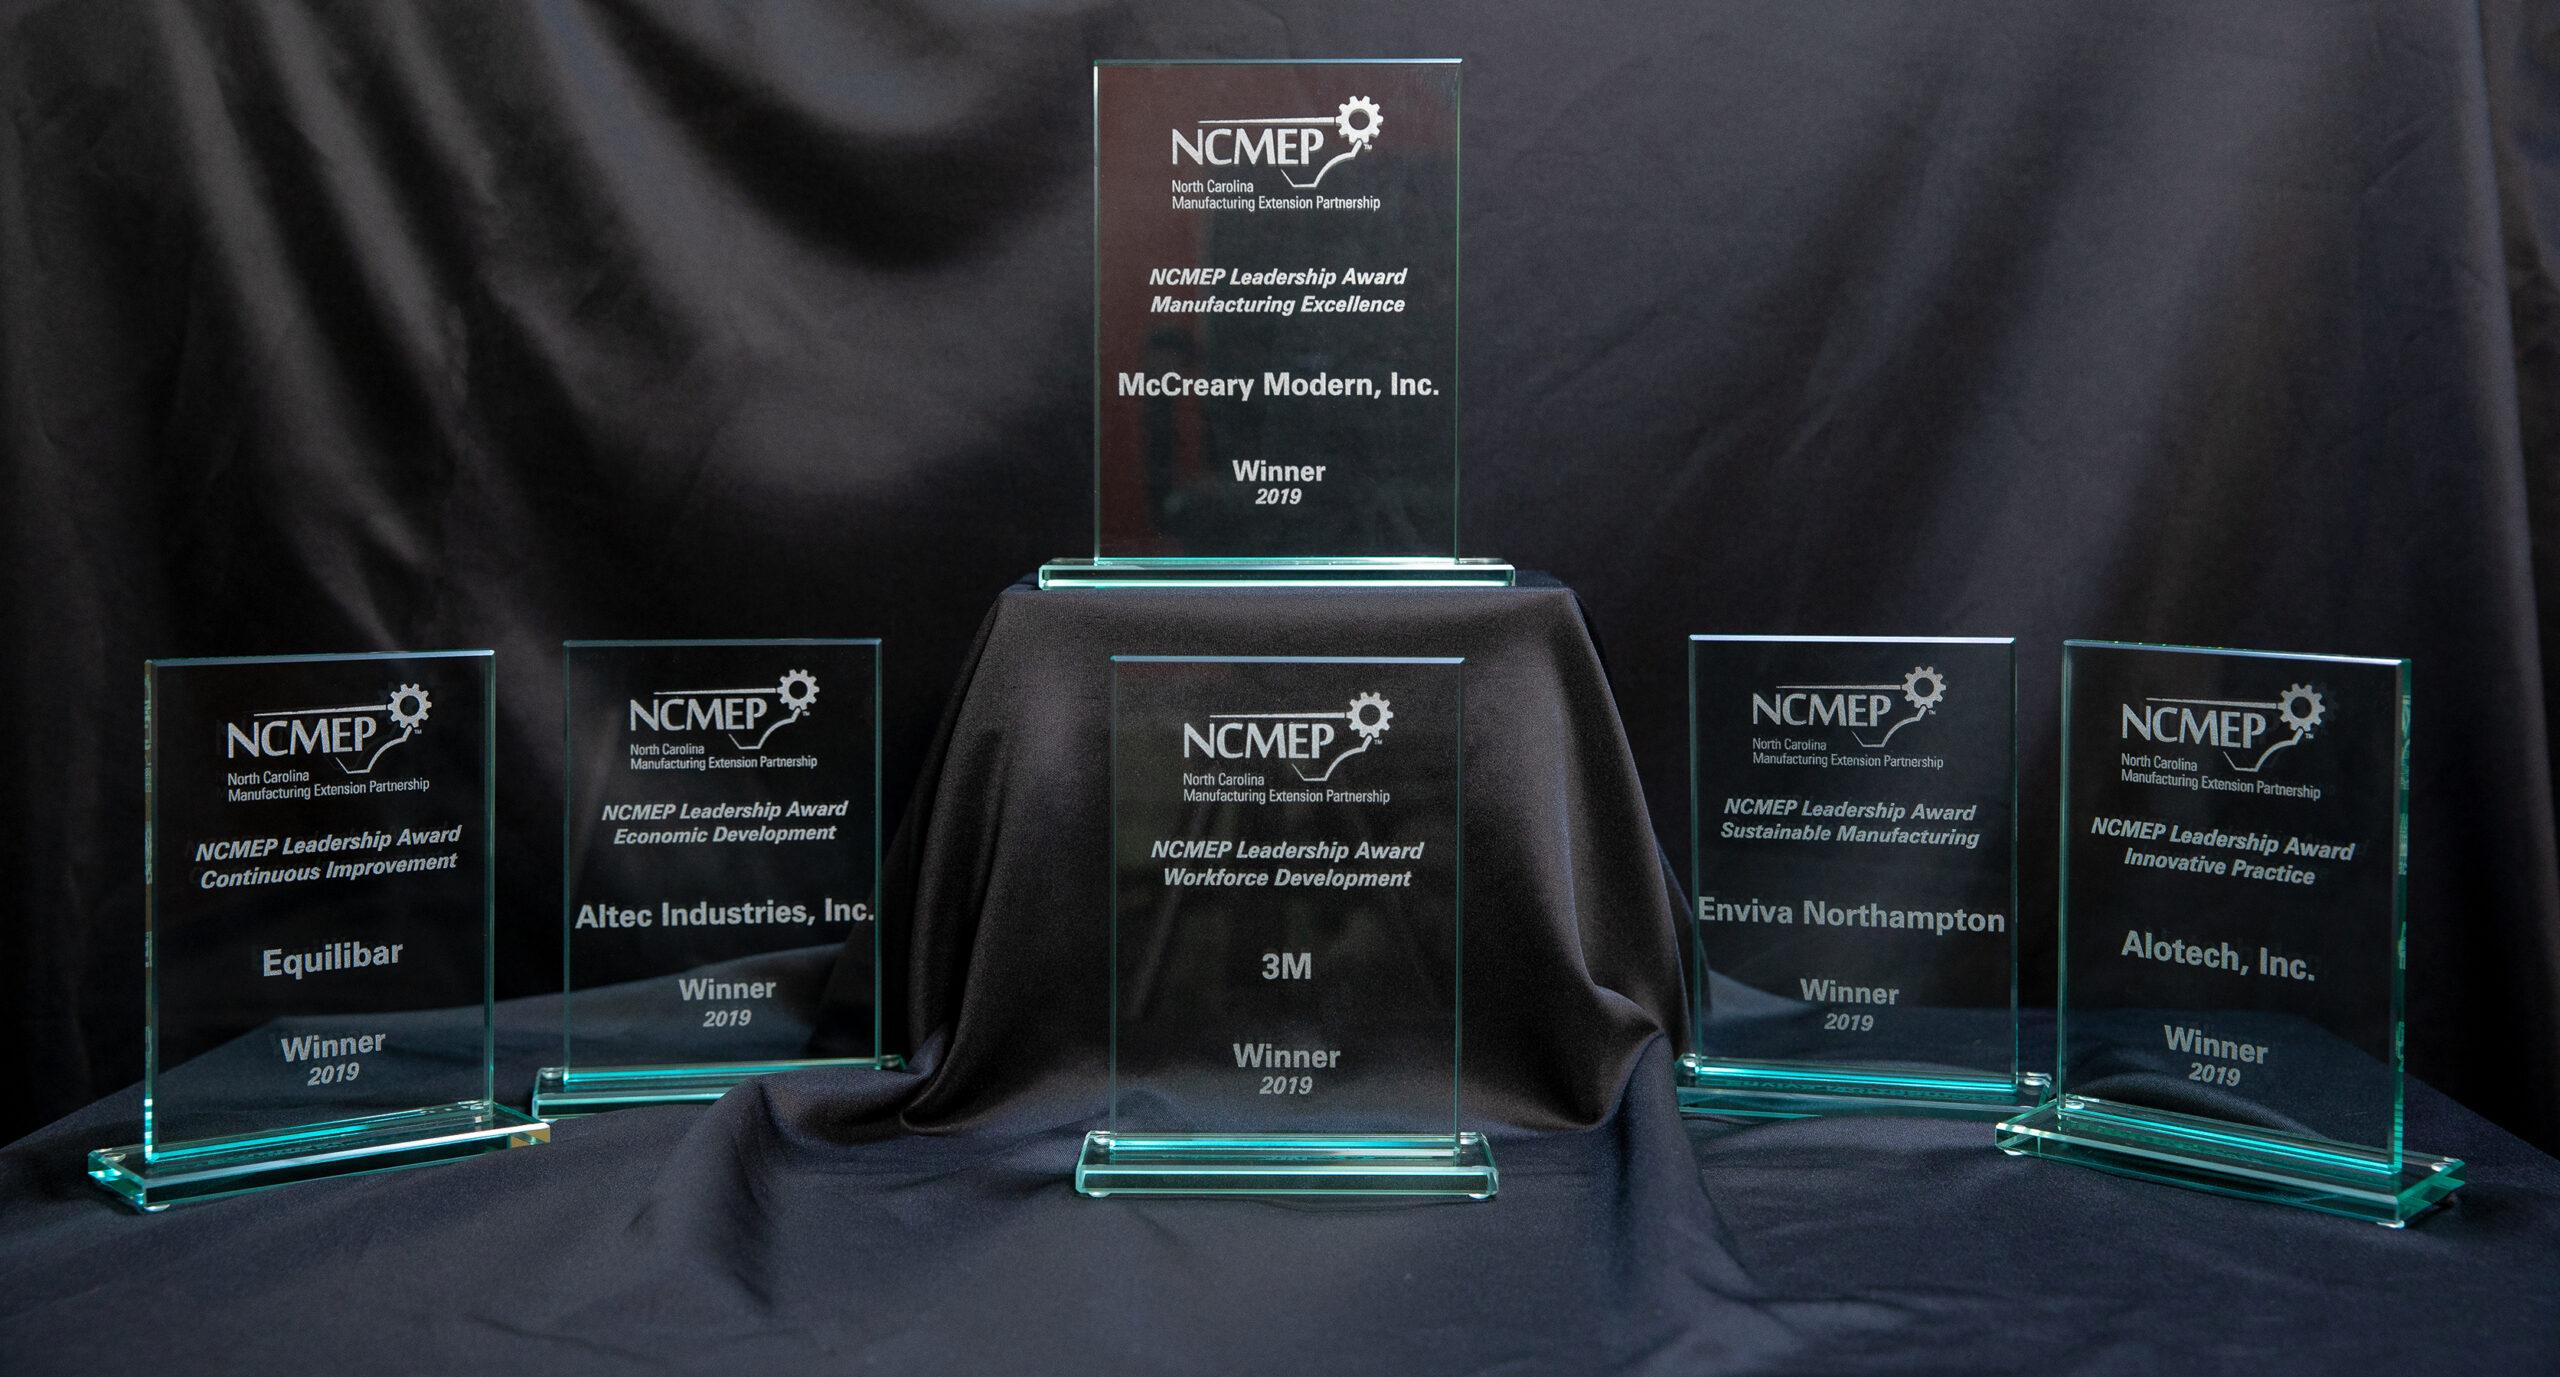 MFGCON19 NCMEP Awards Photo